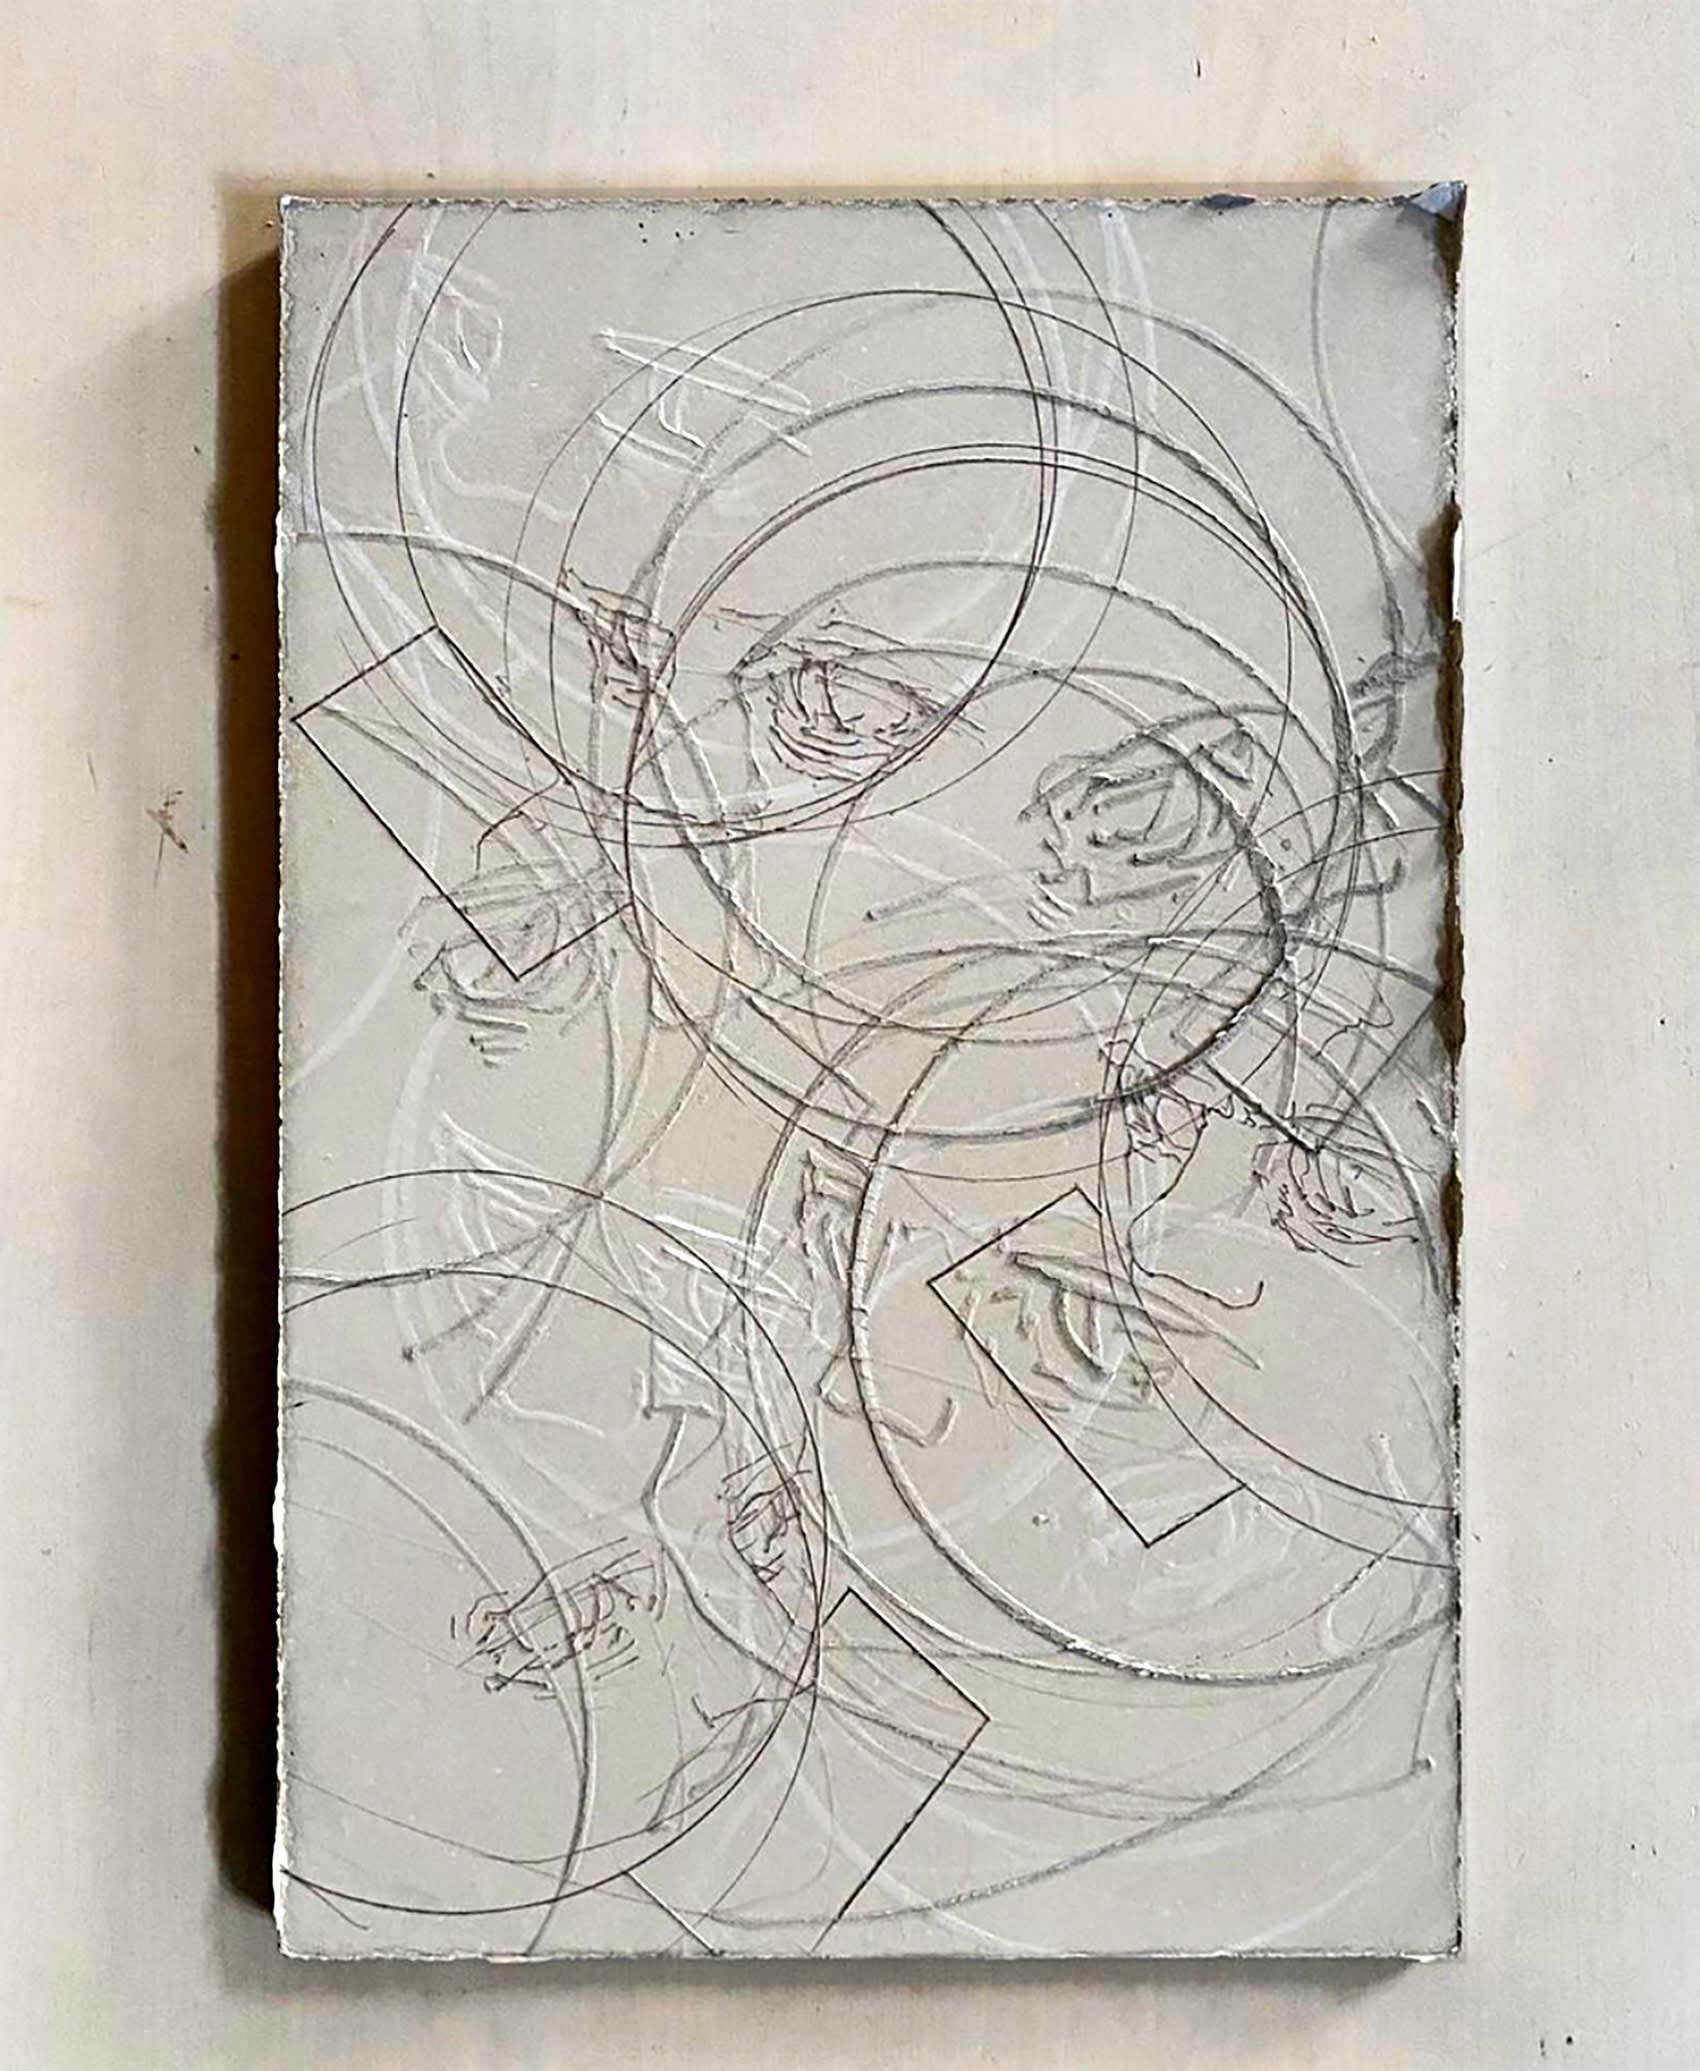 stylianos schicho , artist, vienna, new painting,